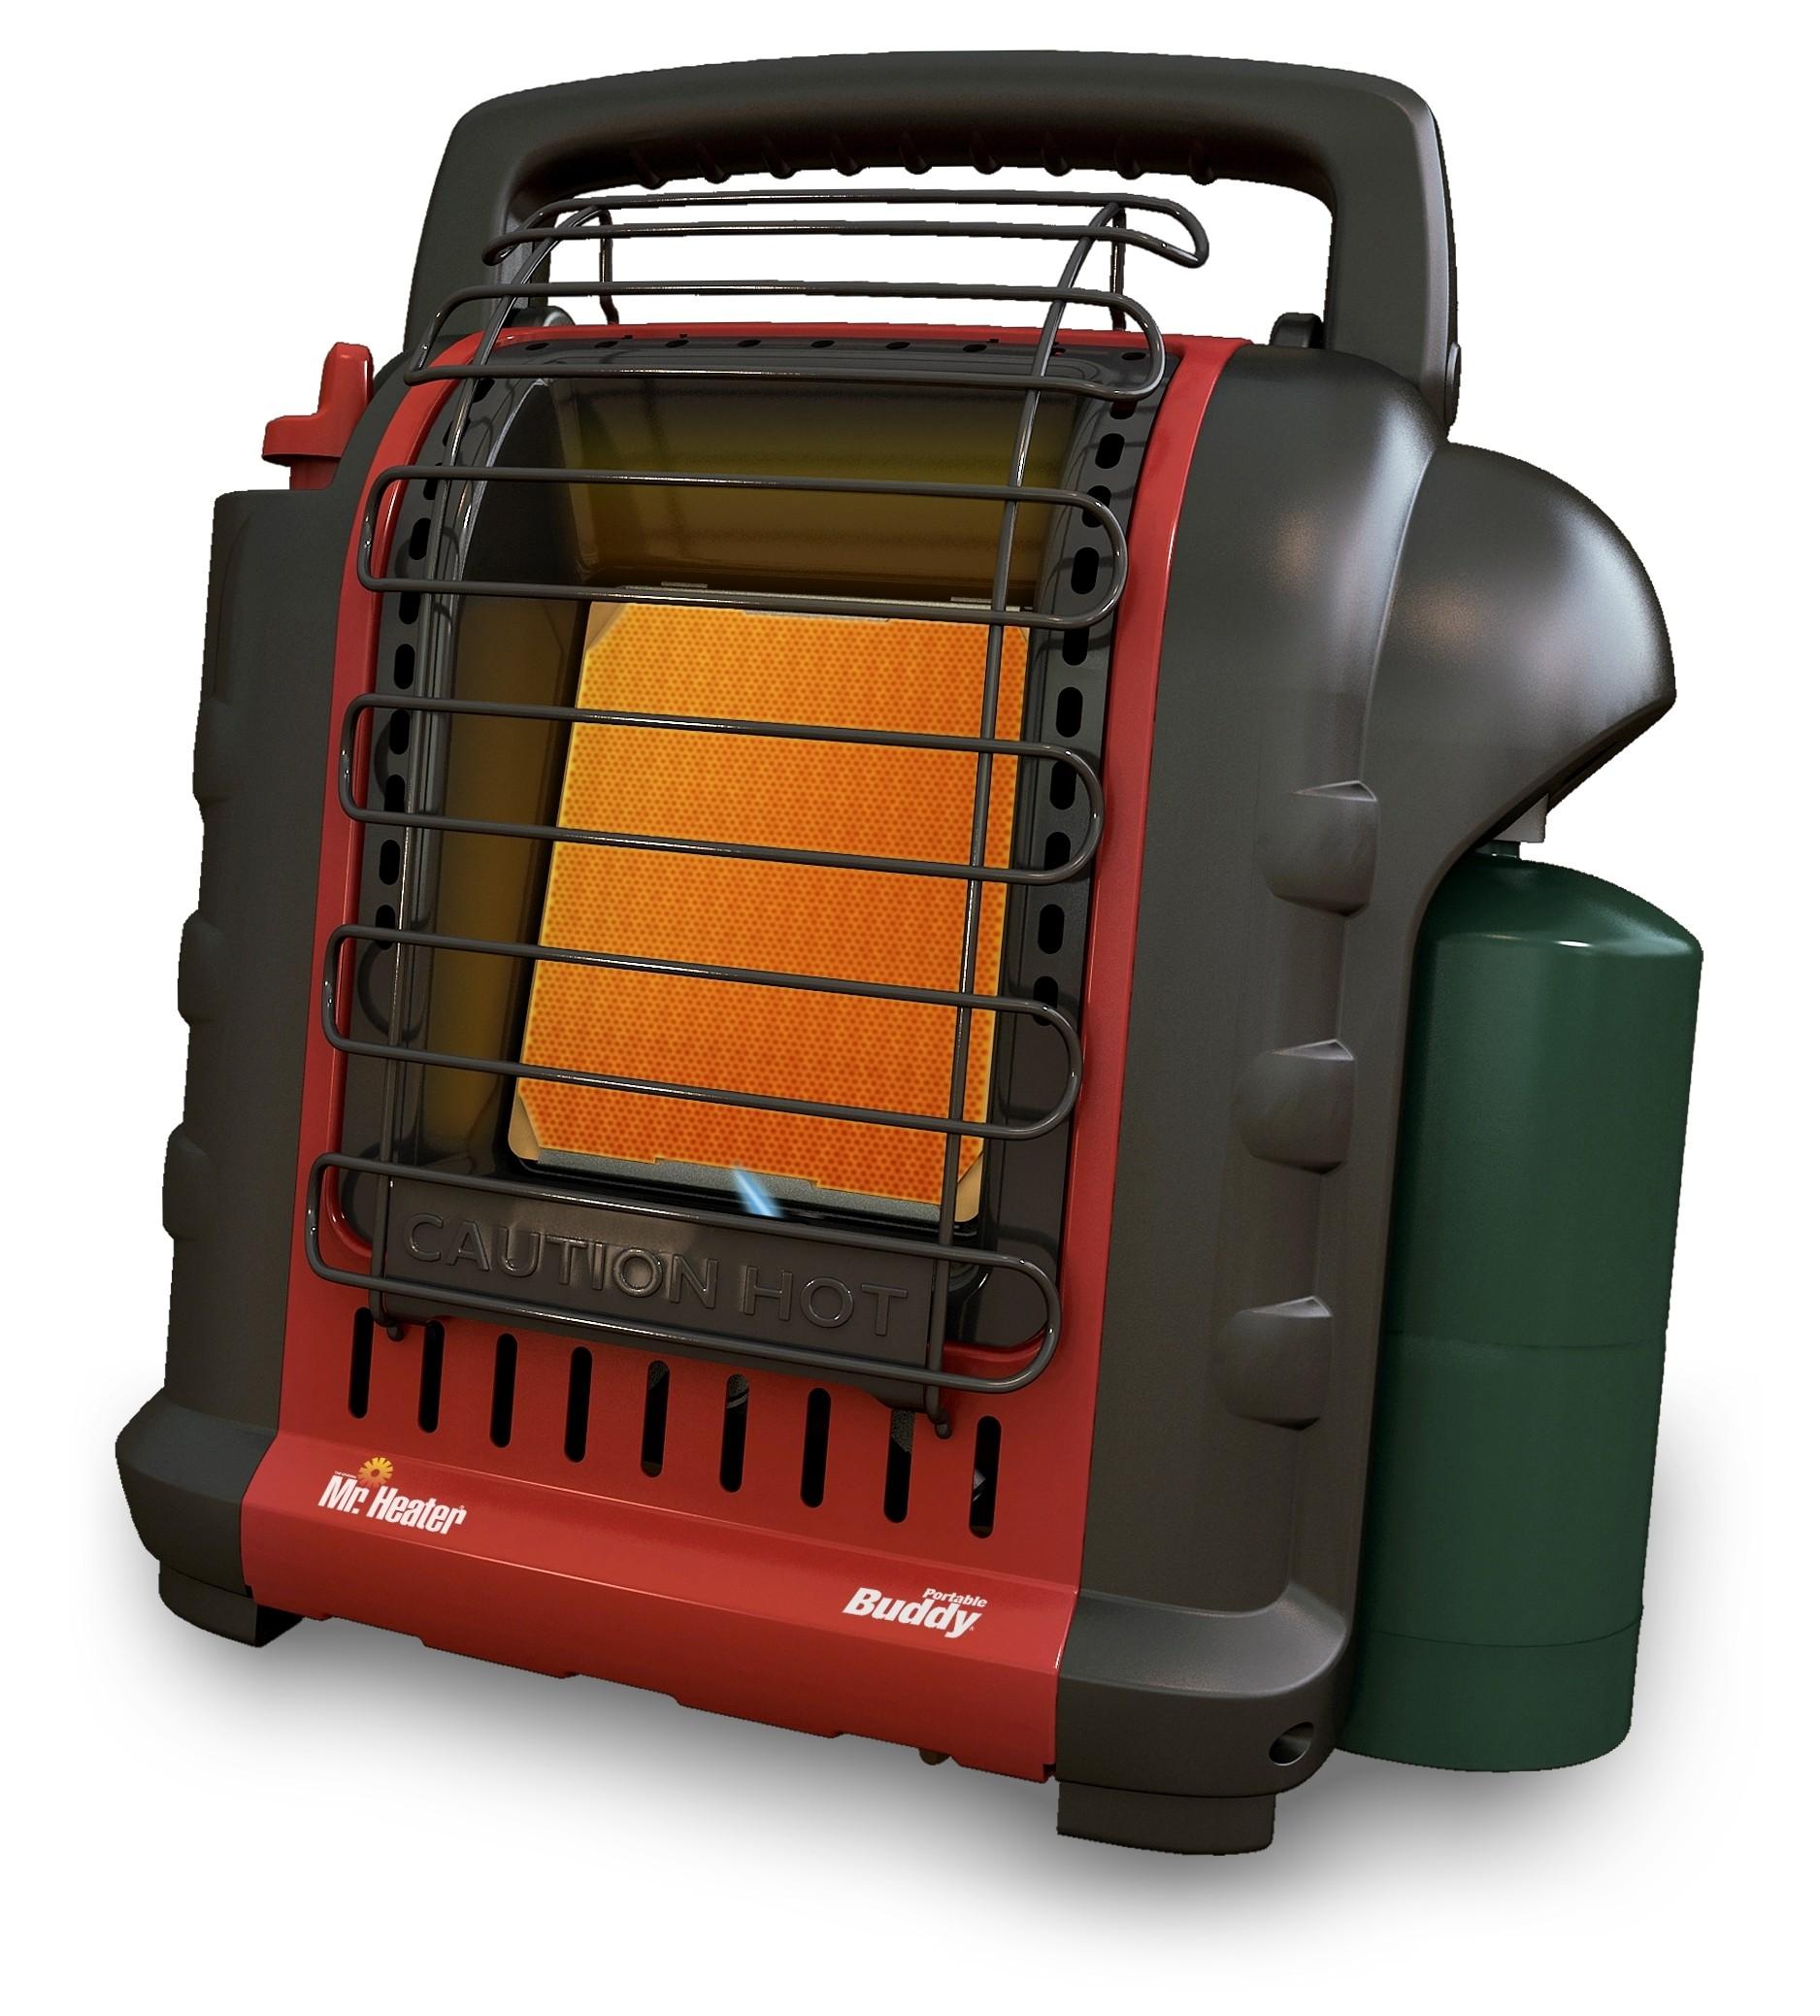 MH9 Portable Buddy 9000 BTU Propane Heater